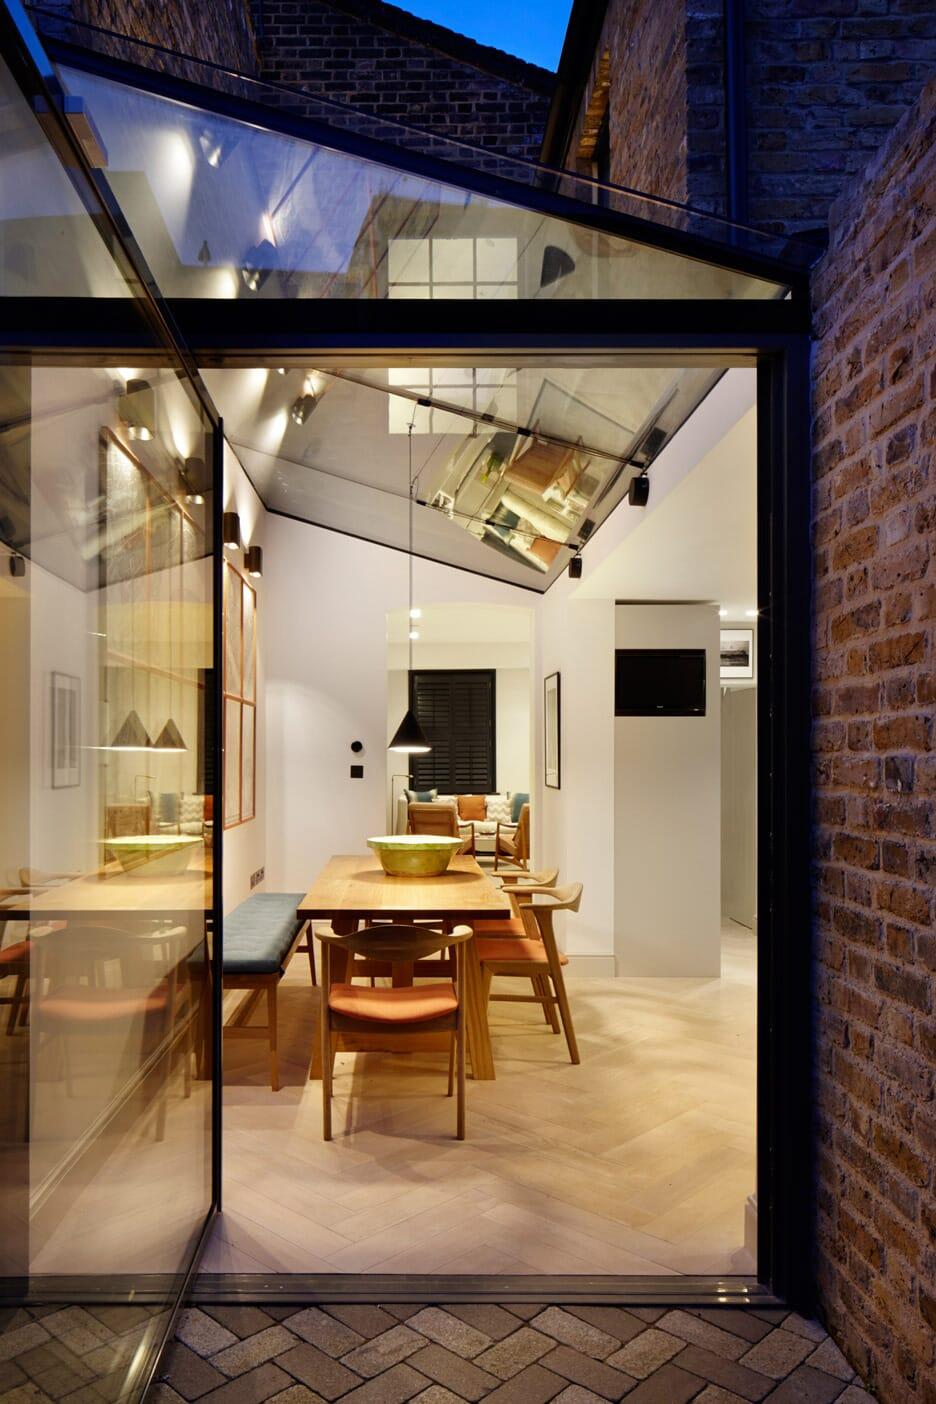 lambeth-marsh-house-fraher-architects-residential-renovation-london-uk_dezeen_936_17